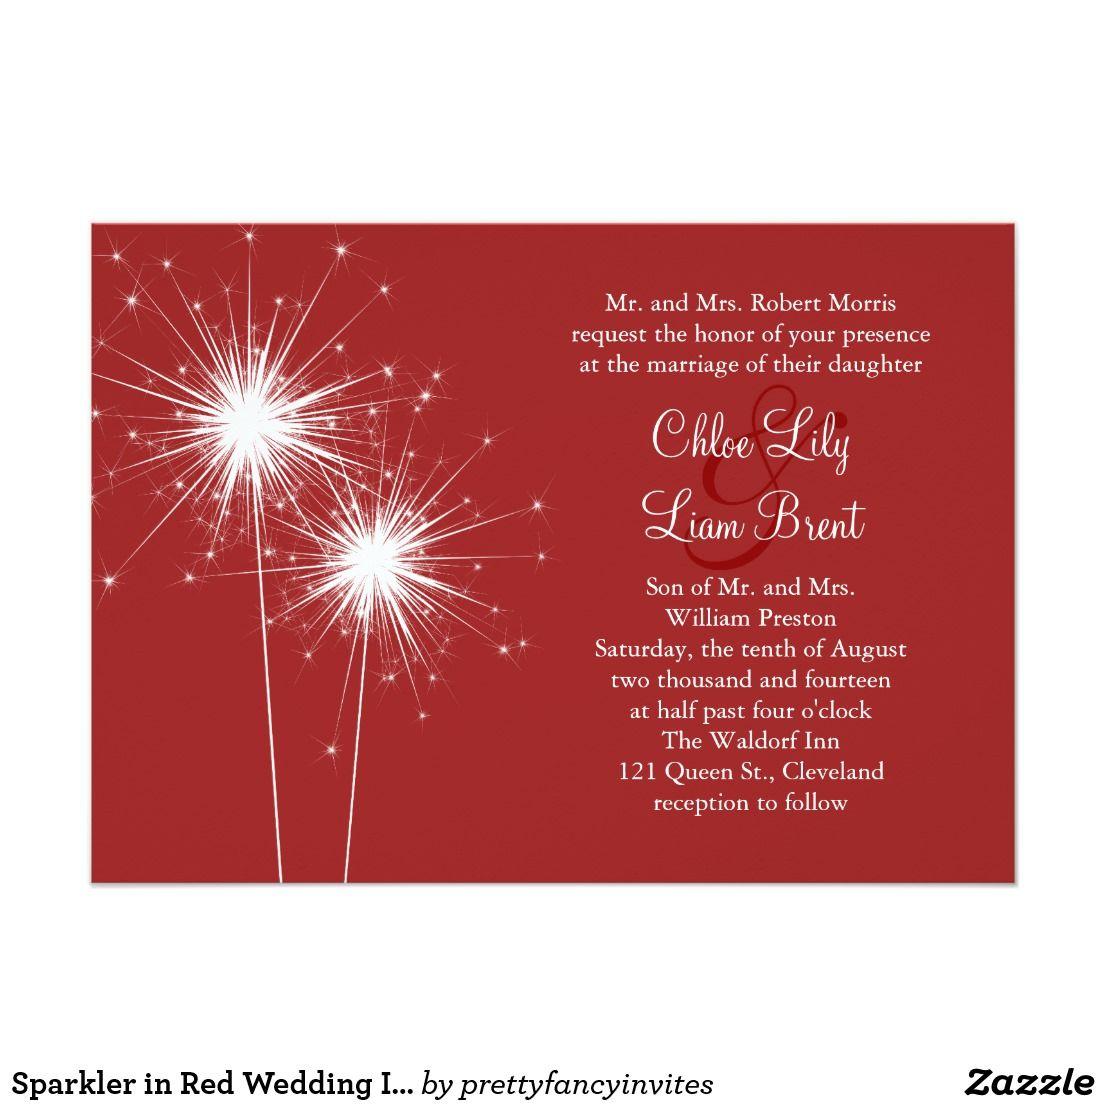 Sparkler in Red Wedding Invitation | Red wedding invitations, Red ...